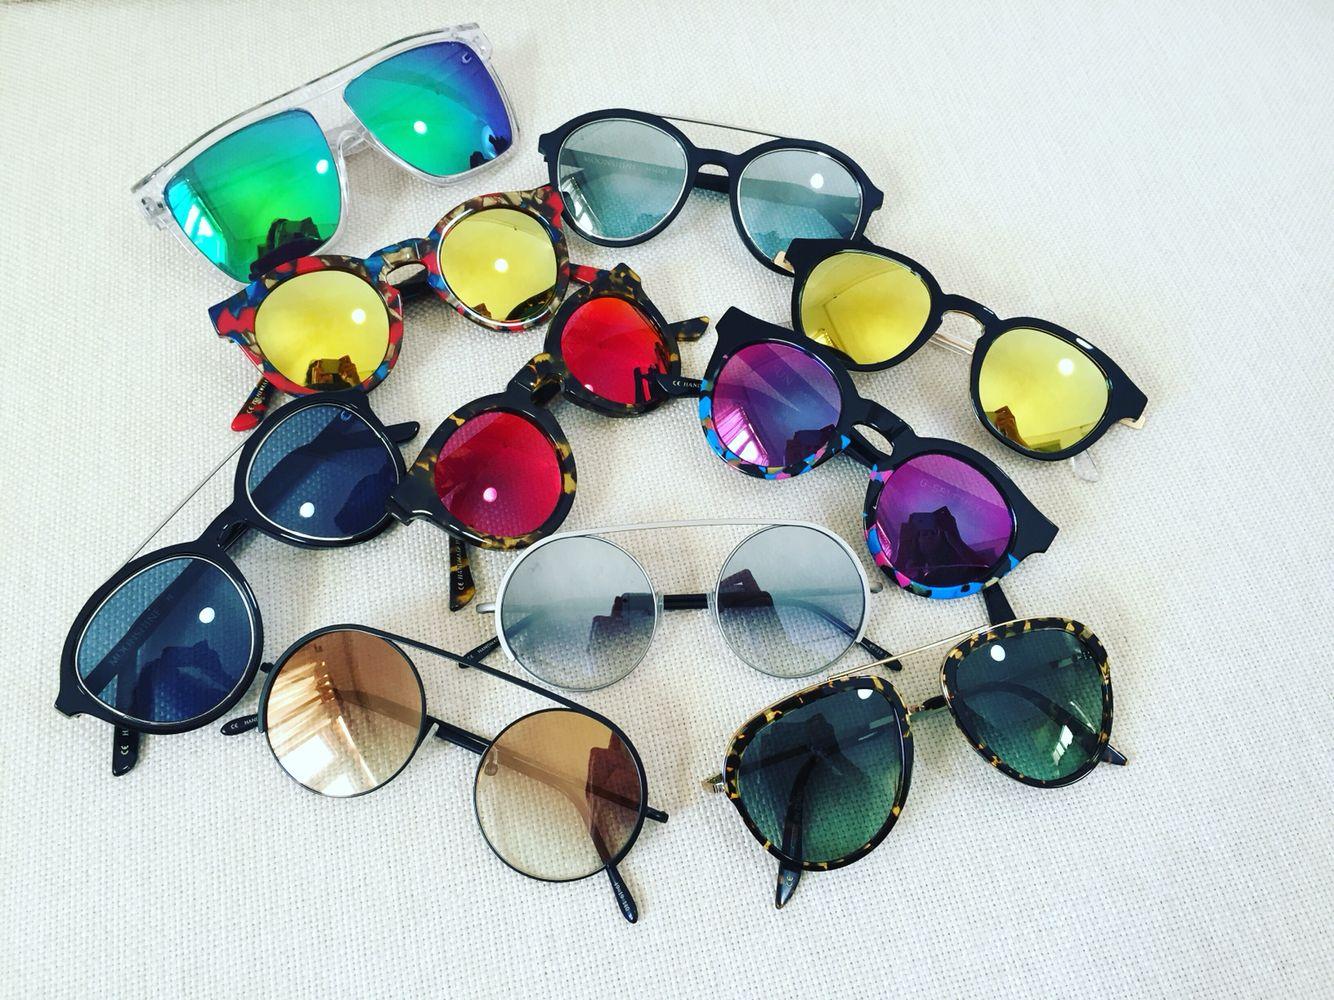 Addicted to G-Sevenstars sunglasses!! Italian handmade sunglasses with Mazzucchelli acetate